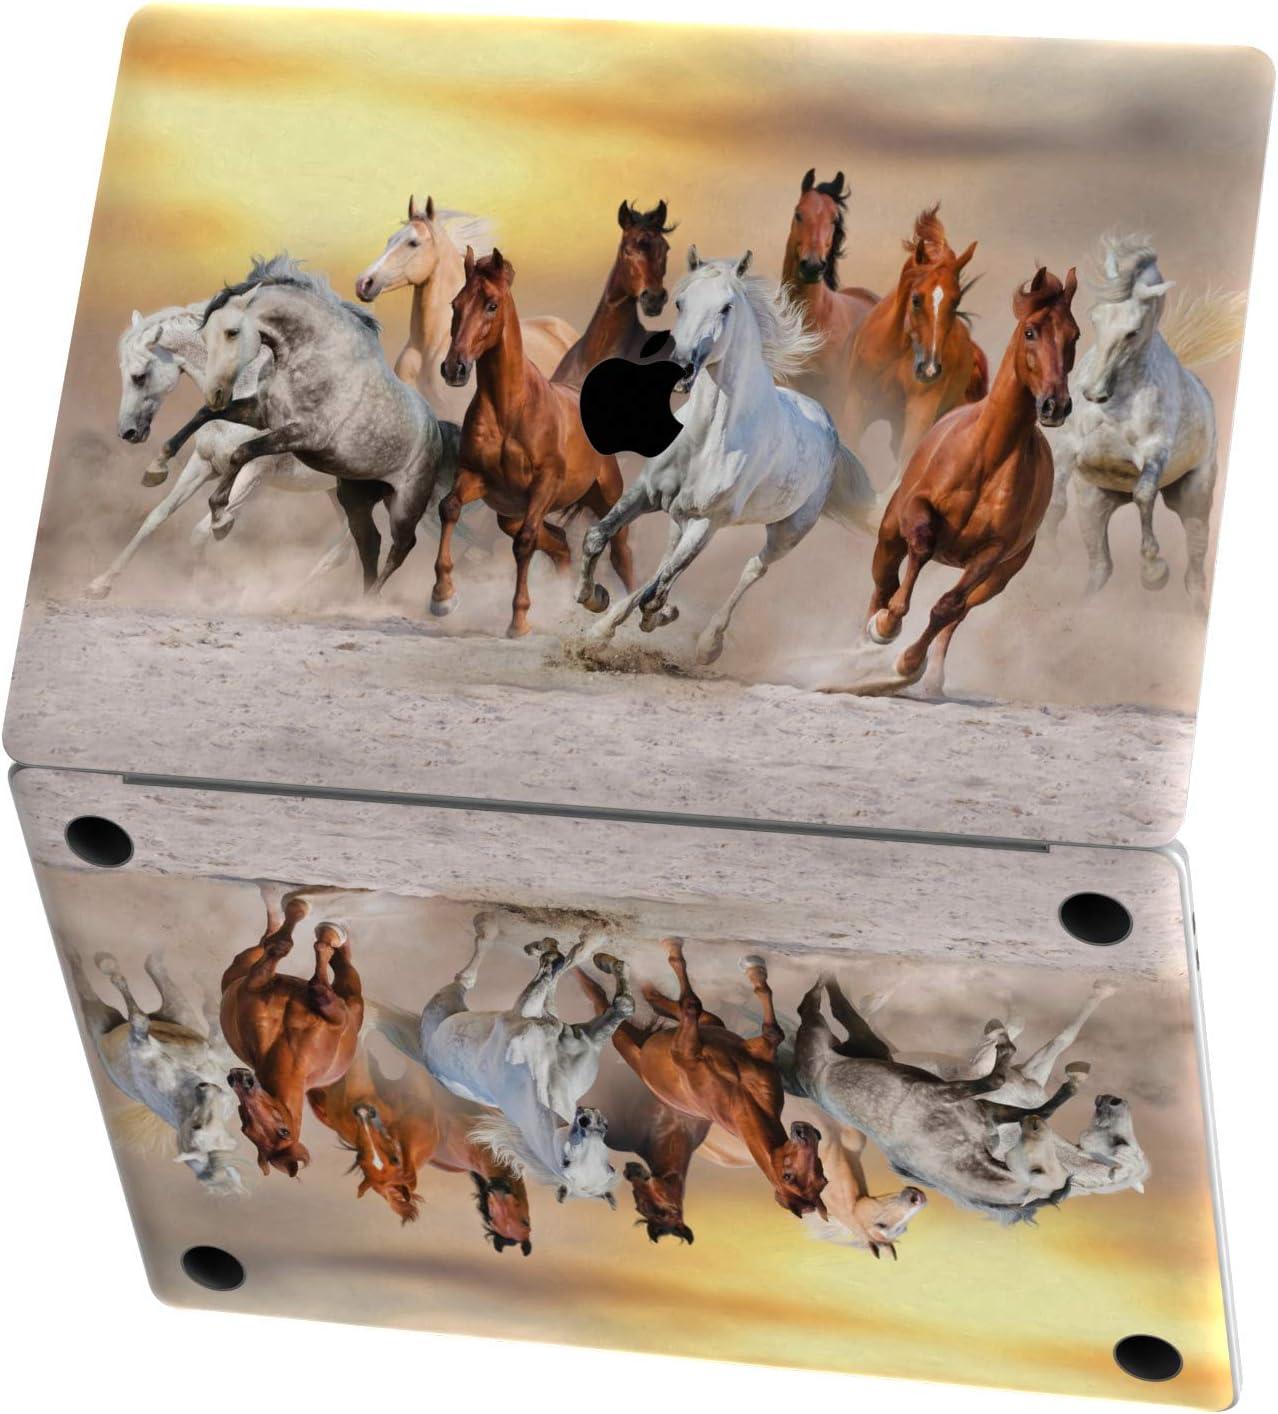 Mertak Vinyl Skin for Apple MacBook Air 13 inch Mac Pro 16 15 Retina 12 11 2020 2019 2018 2017 Running Horses Decal Wild Wrap Western Cover Print Nature Herd Clear Trackpad Touch Bar Top Animal